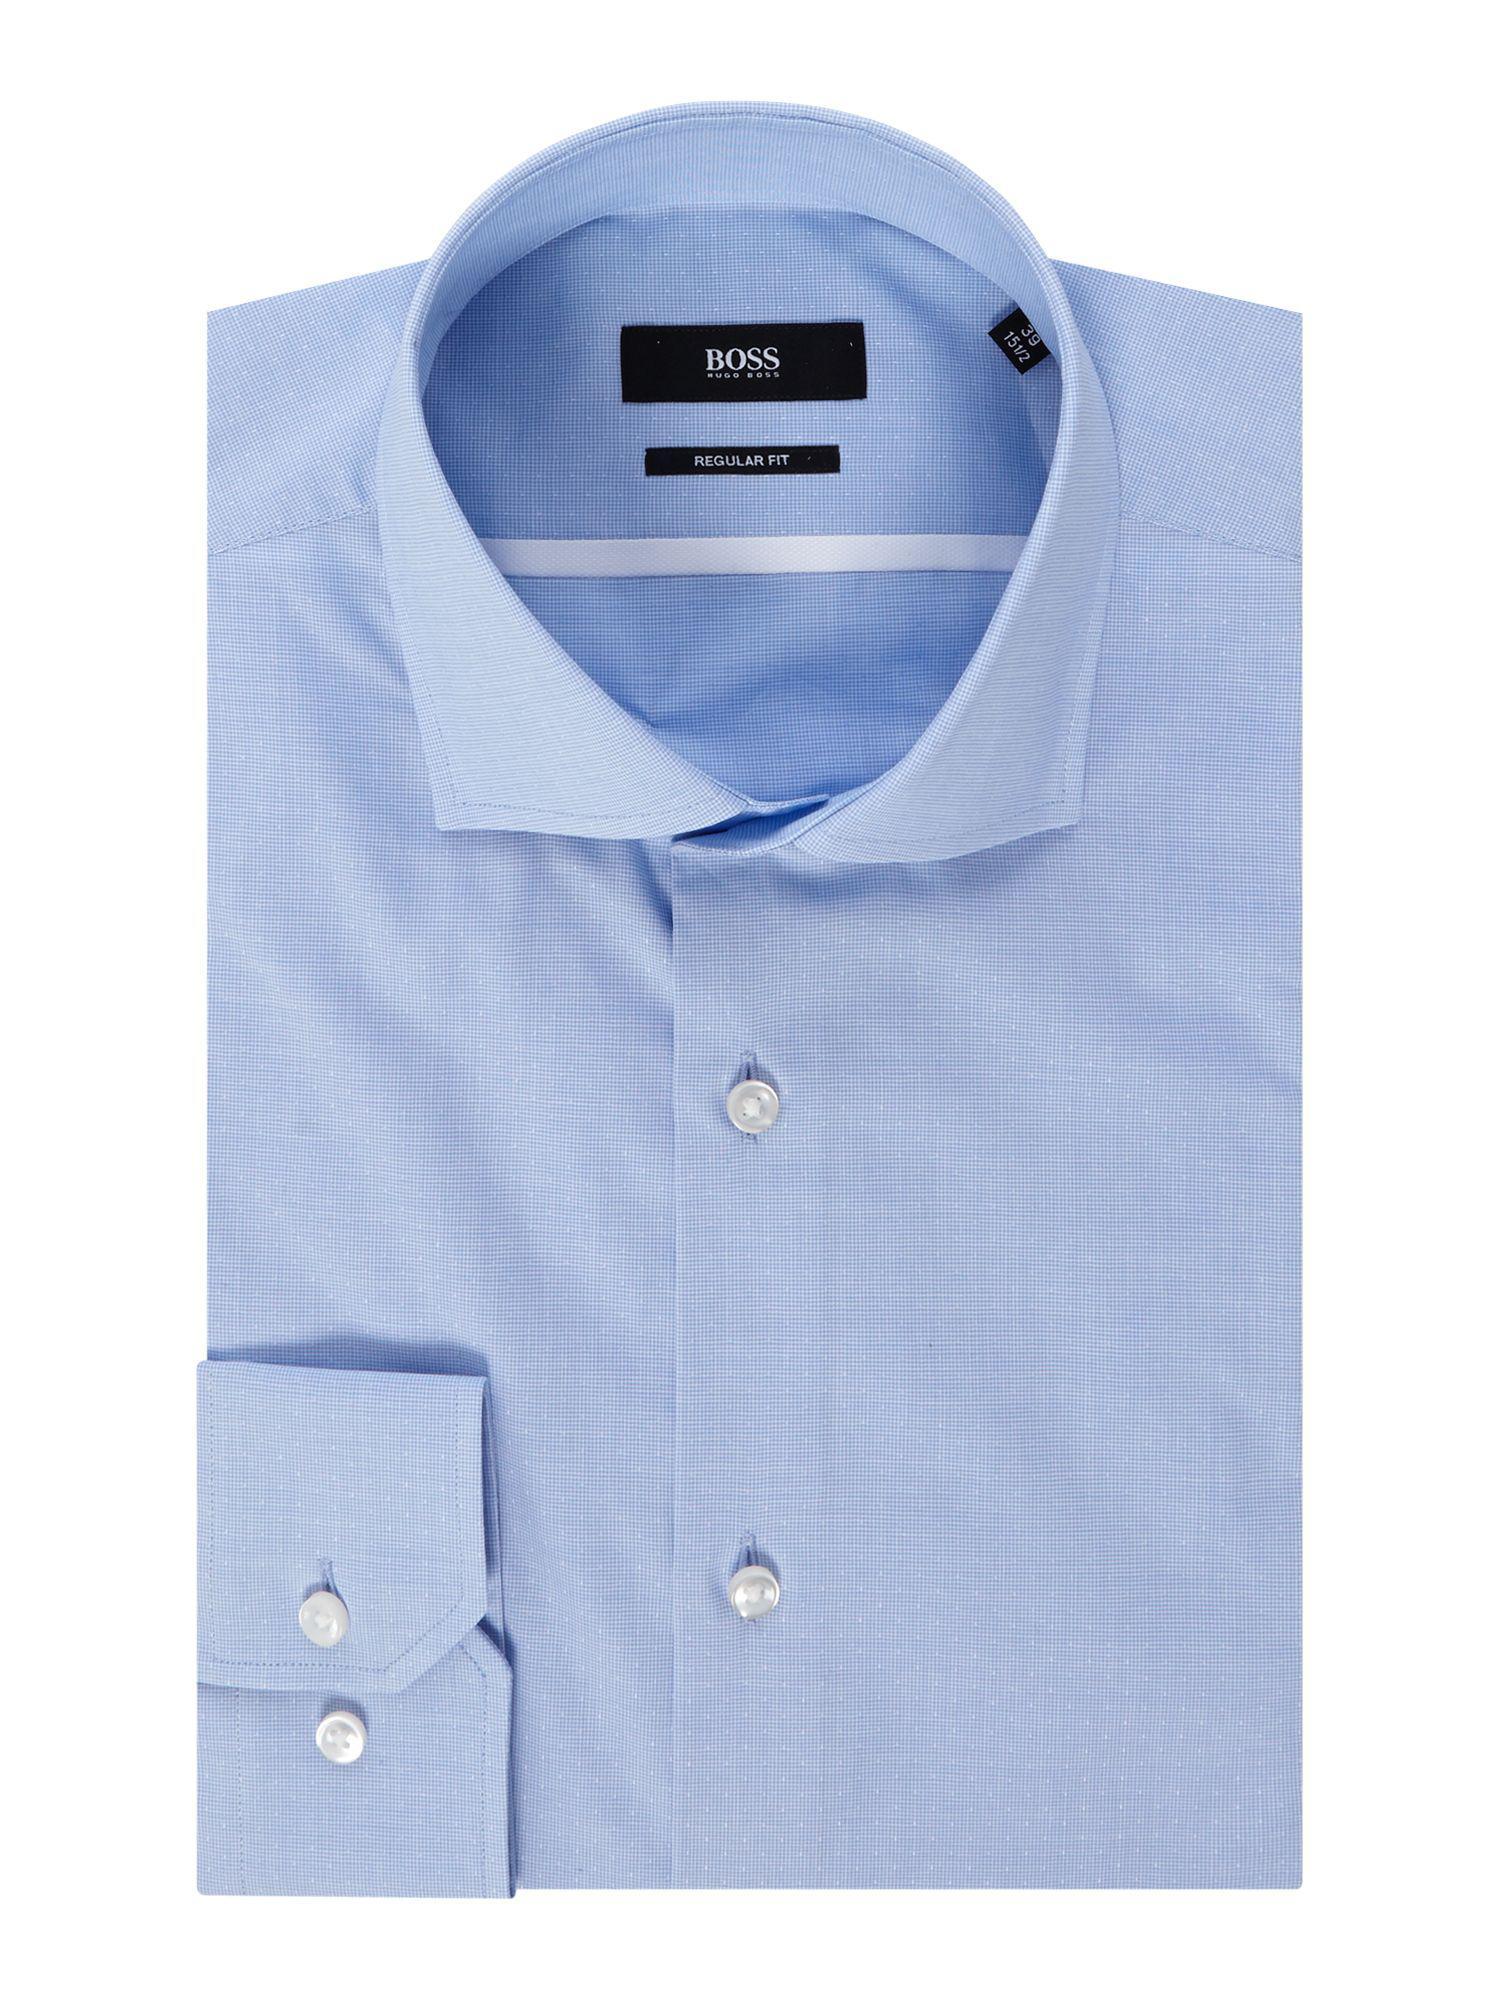 f19b9344d Boss Men's Gert Regular Fit Micro Dot in Blue for Men - Lyst